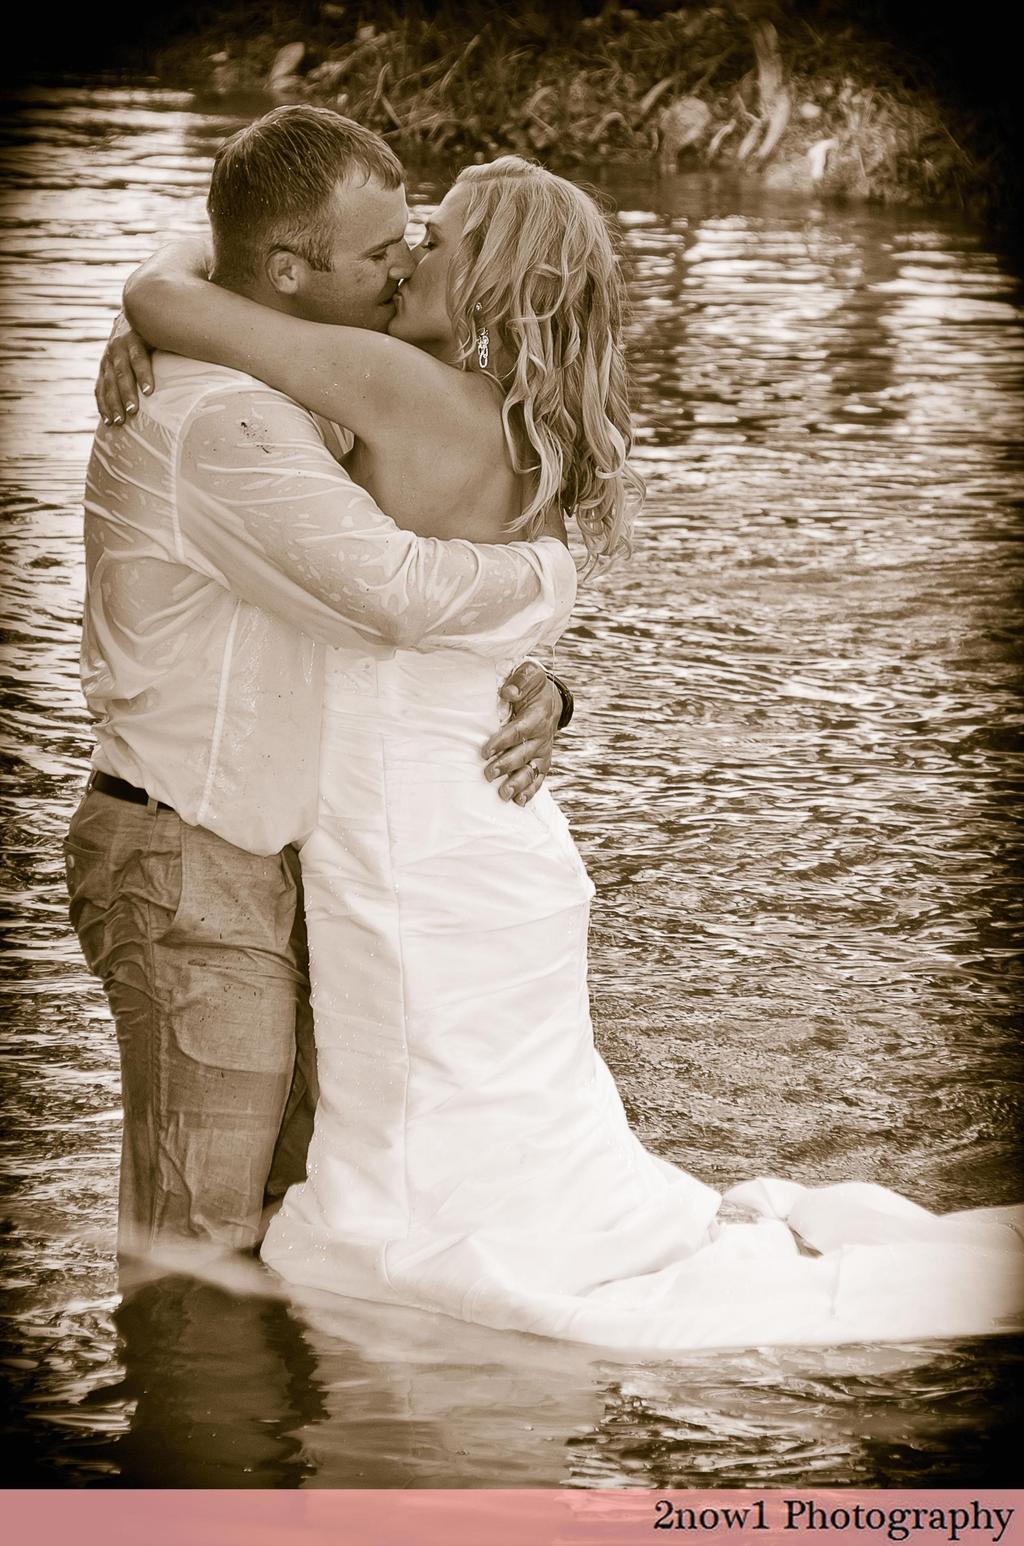 Wimberley_texas_weddings_lacey_wes_sneak_peek_2now1photo.com_32.full